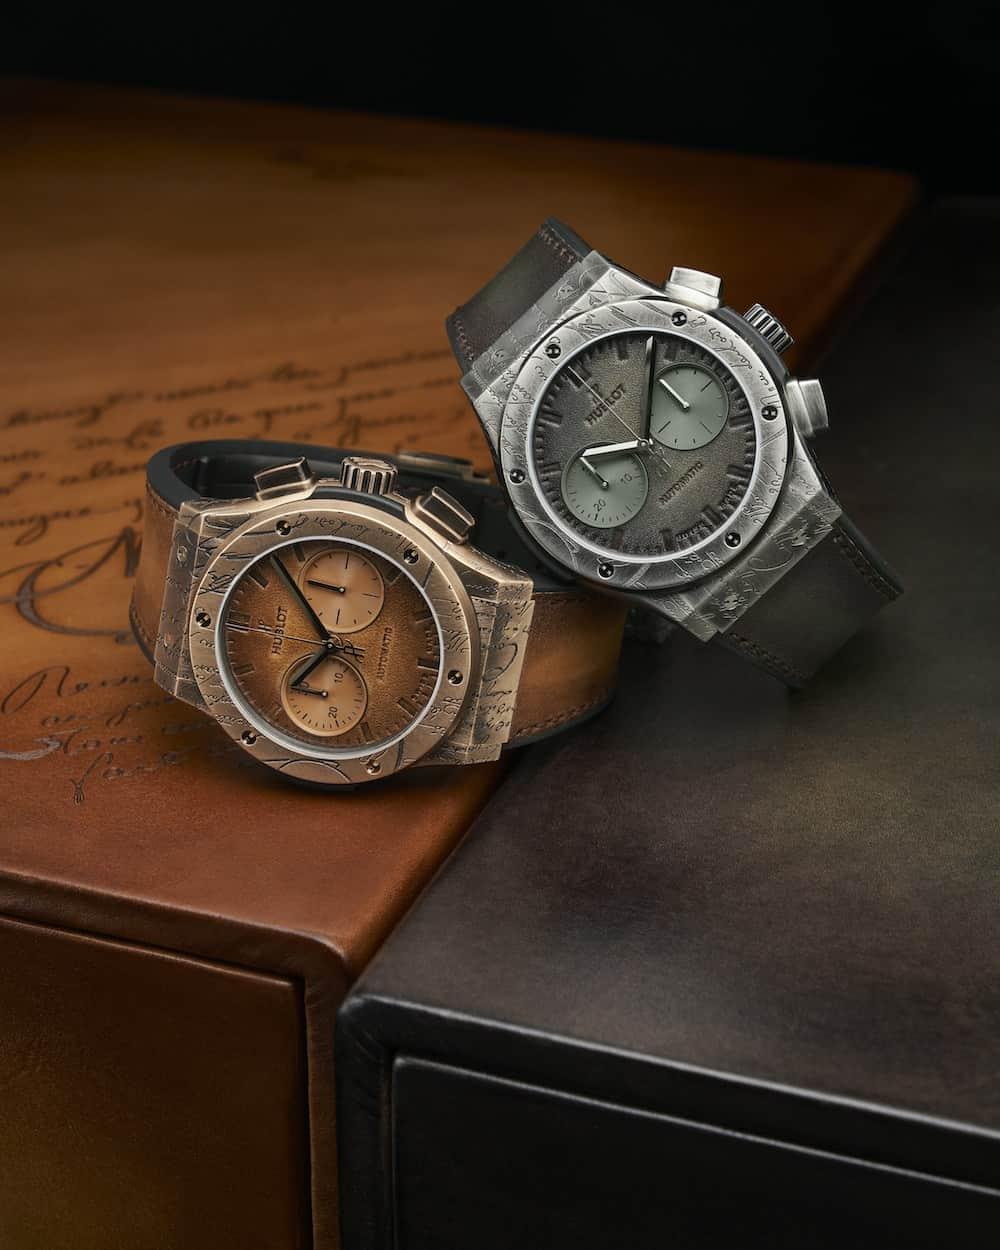 Hublot Classic Fusion Berluti watch 2